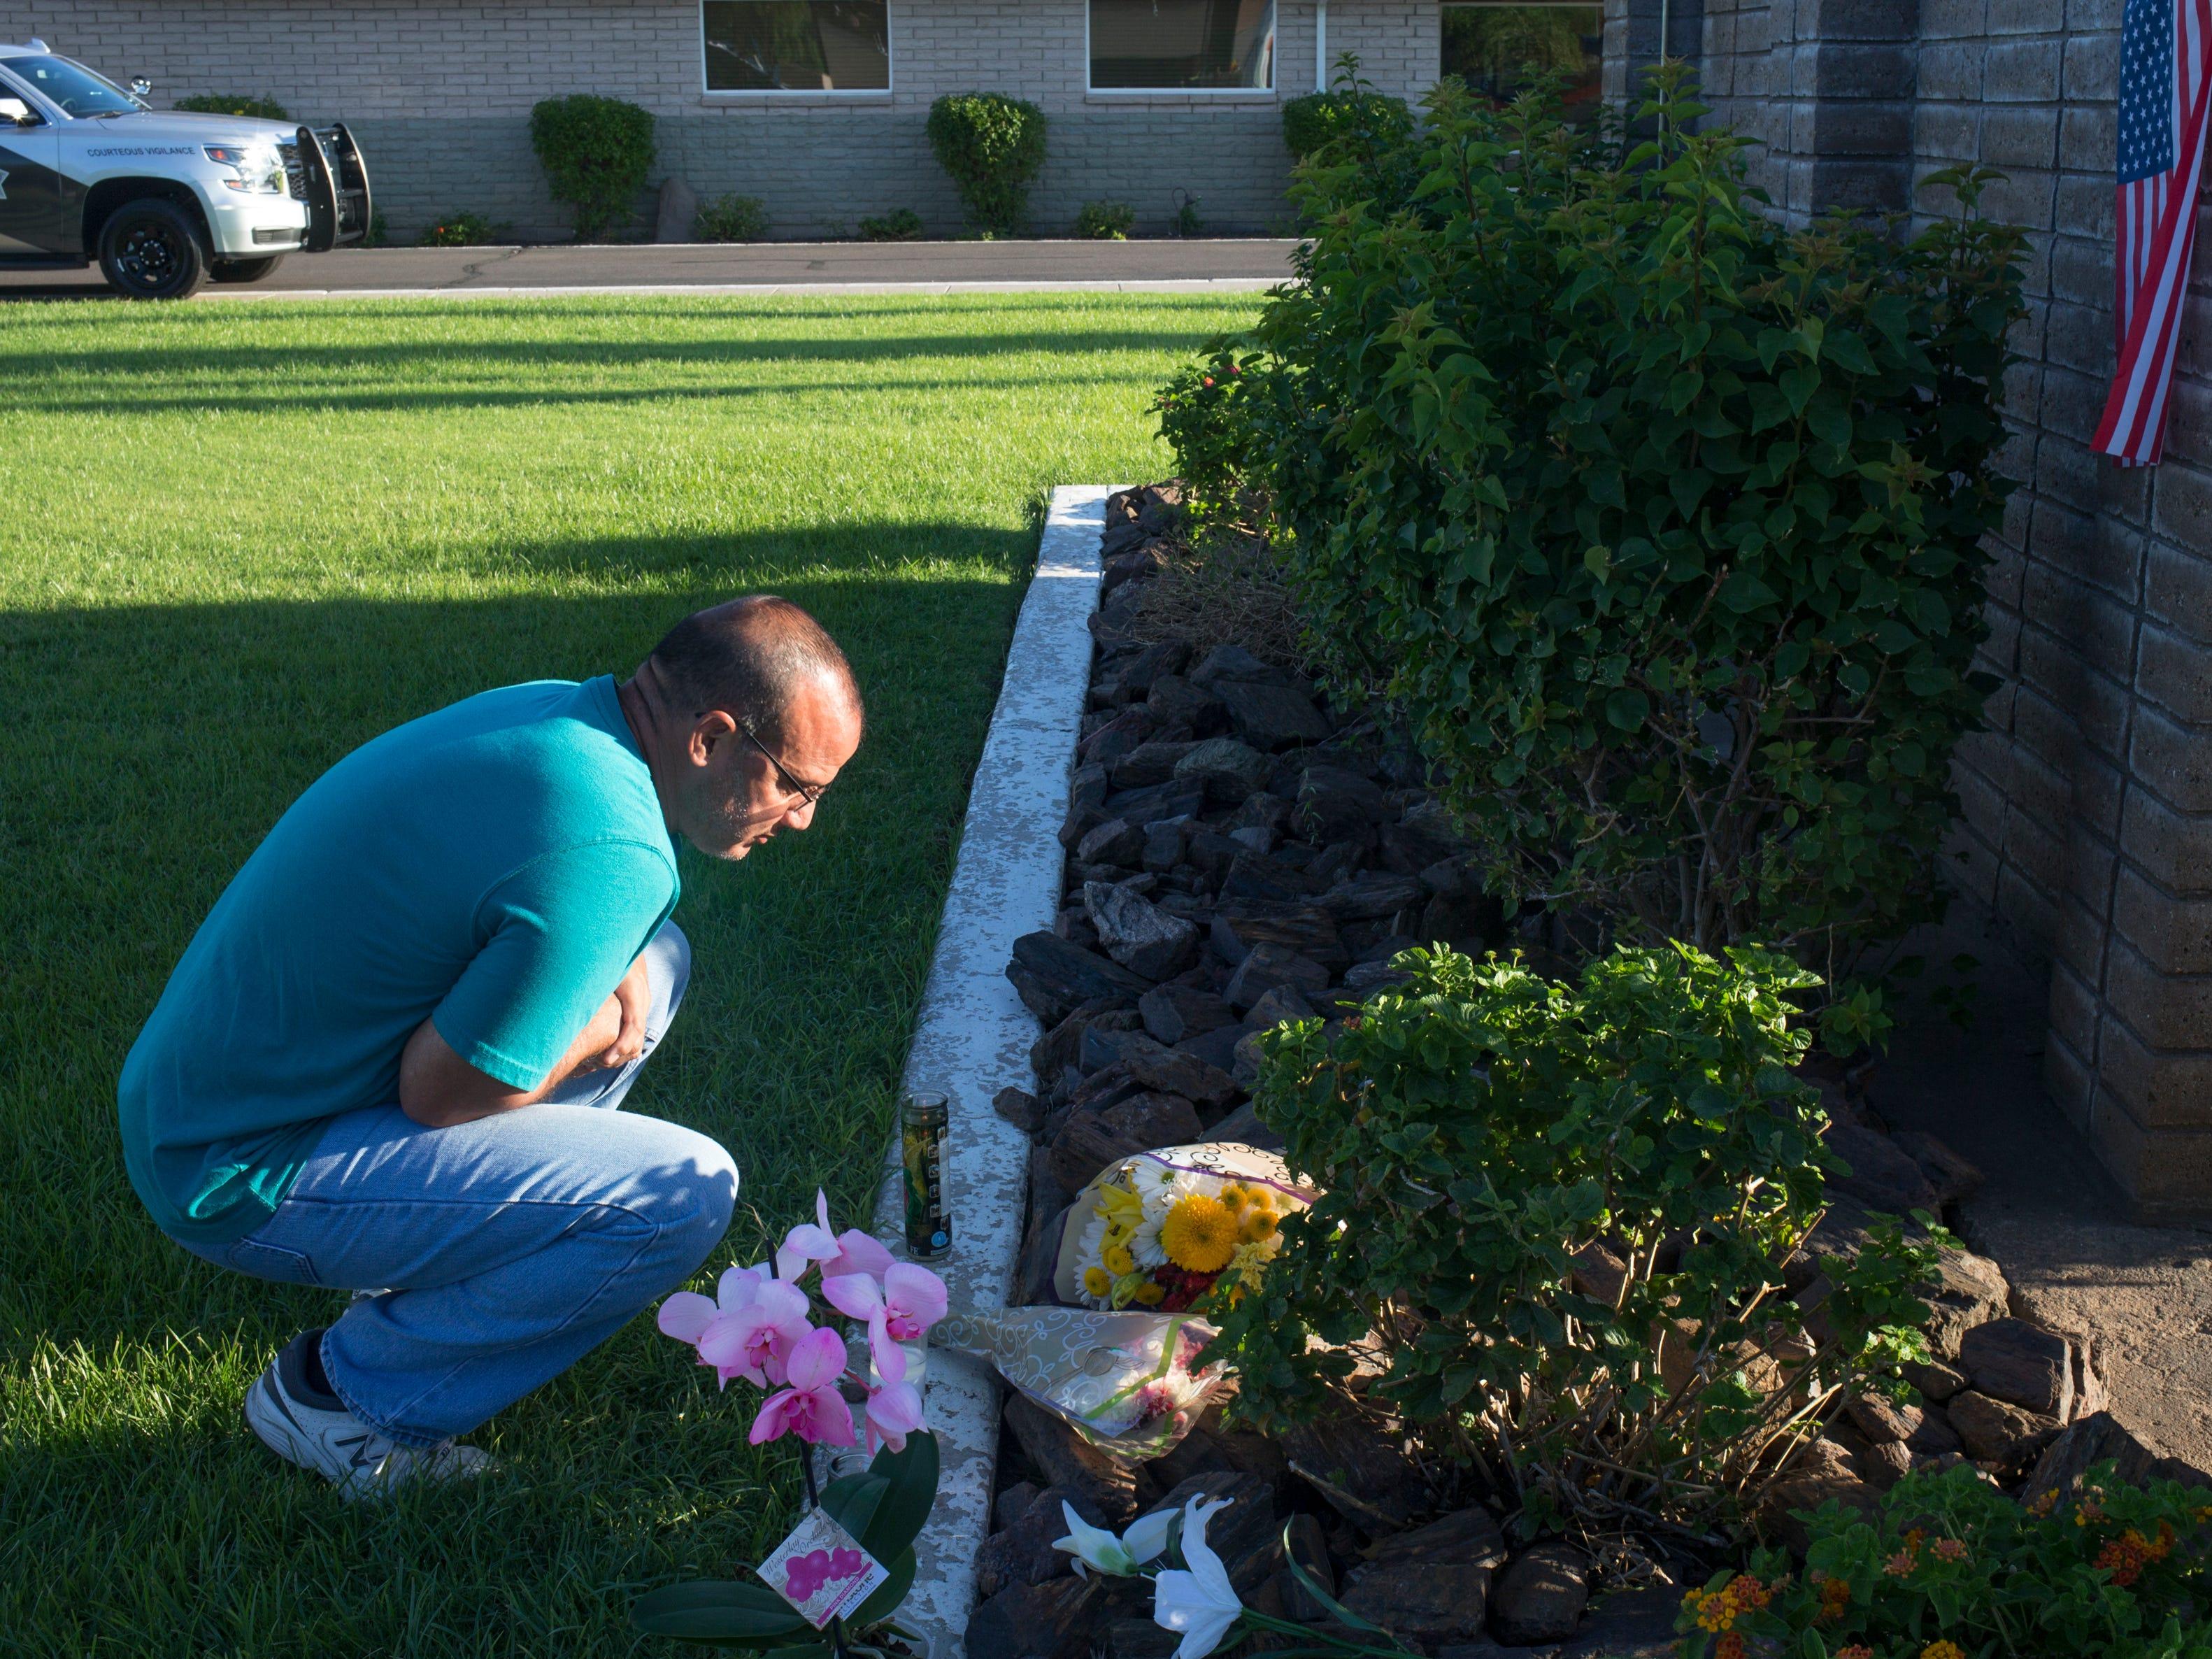 Dan Rivera visits the makeshift memorial to honor Senator John McCain at the A. L. Moore Grimshaw Mortuary, Aug. 26, 2018, at 710 W. Bethany Home Road in Phoenix.